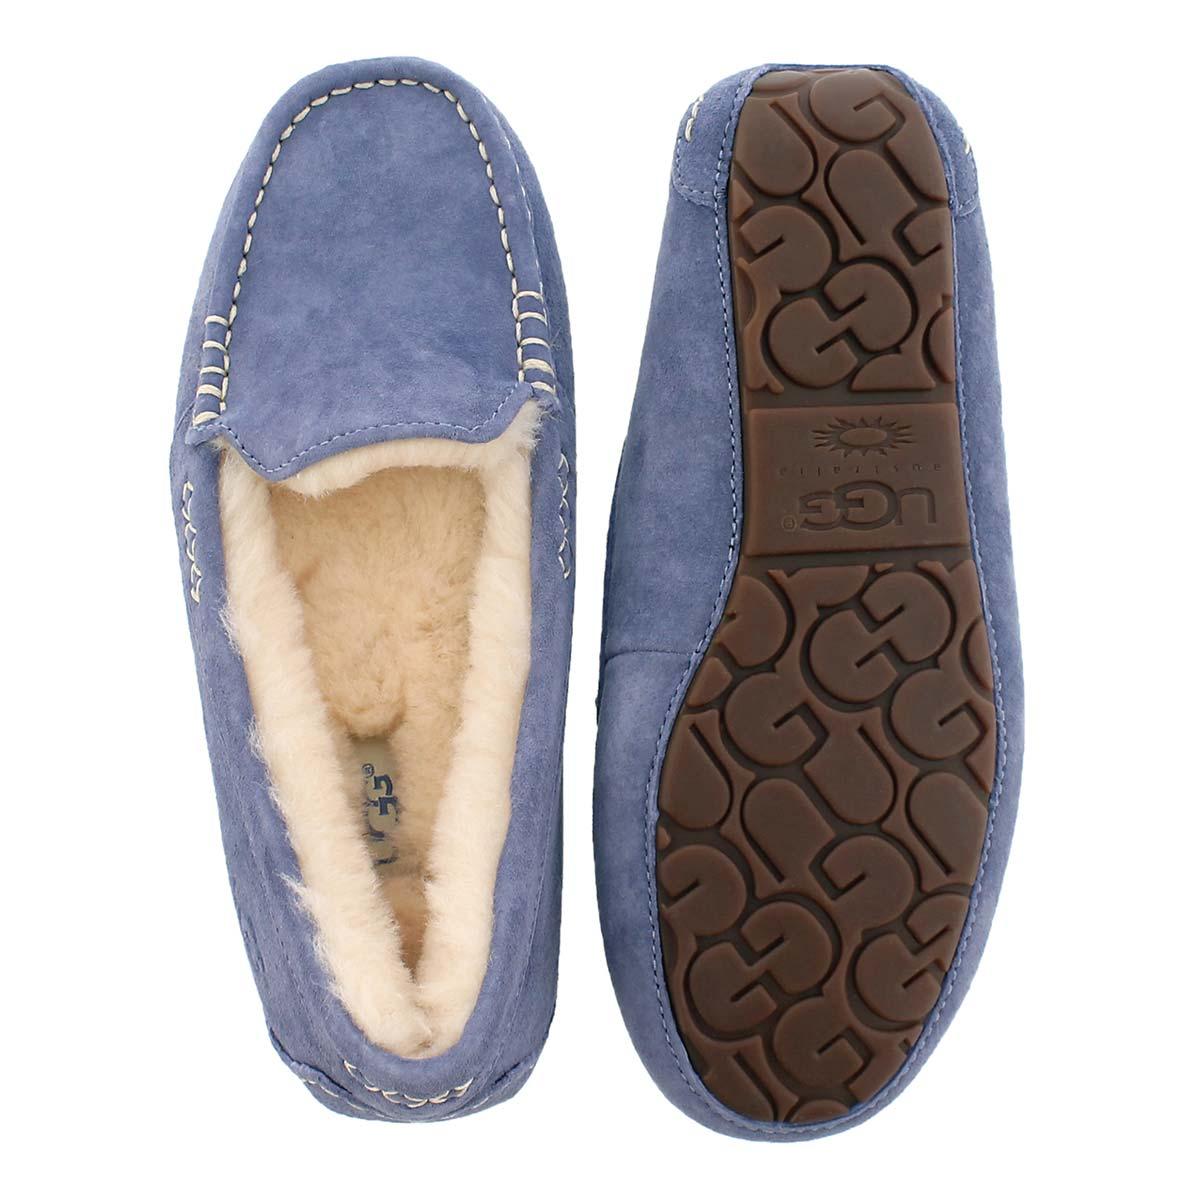 Mocassin ANSLEY, mouton bleu pyjama, fem